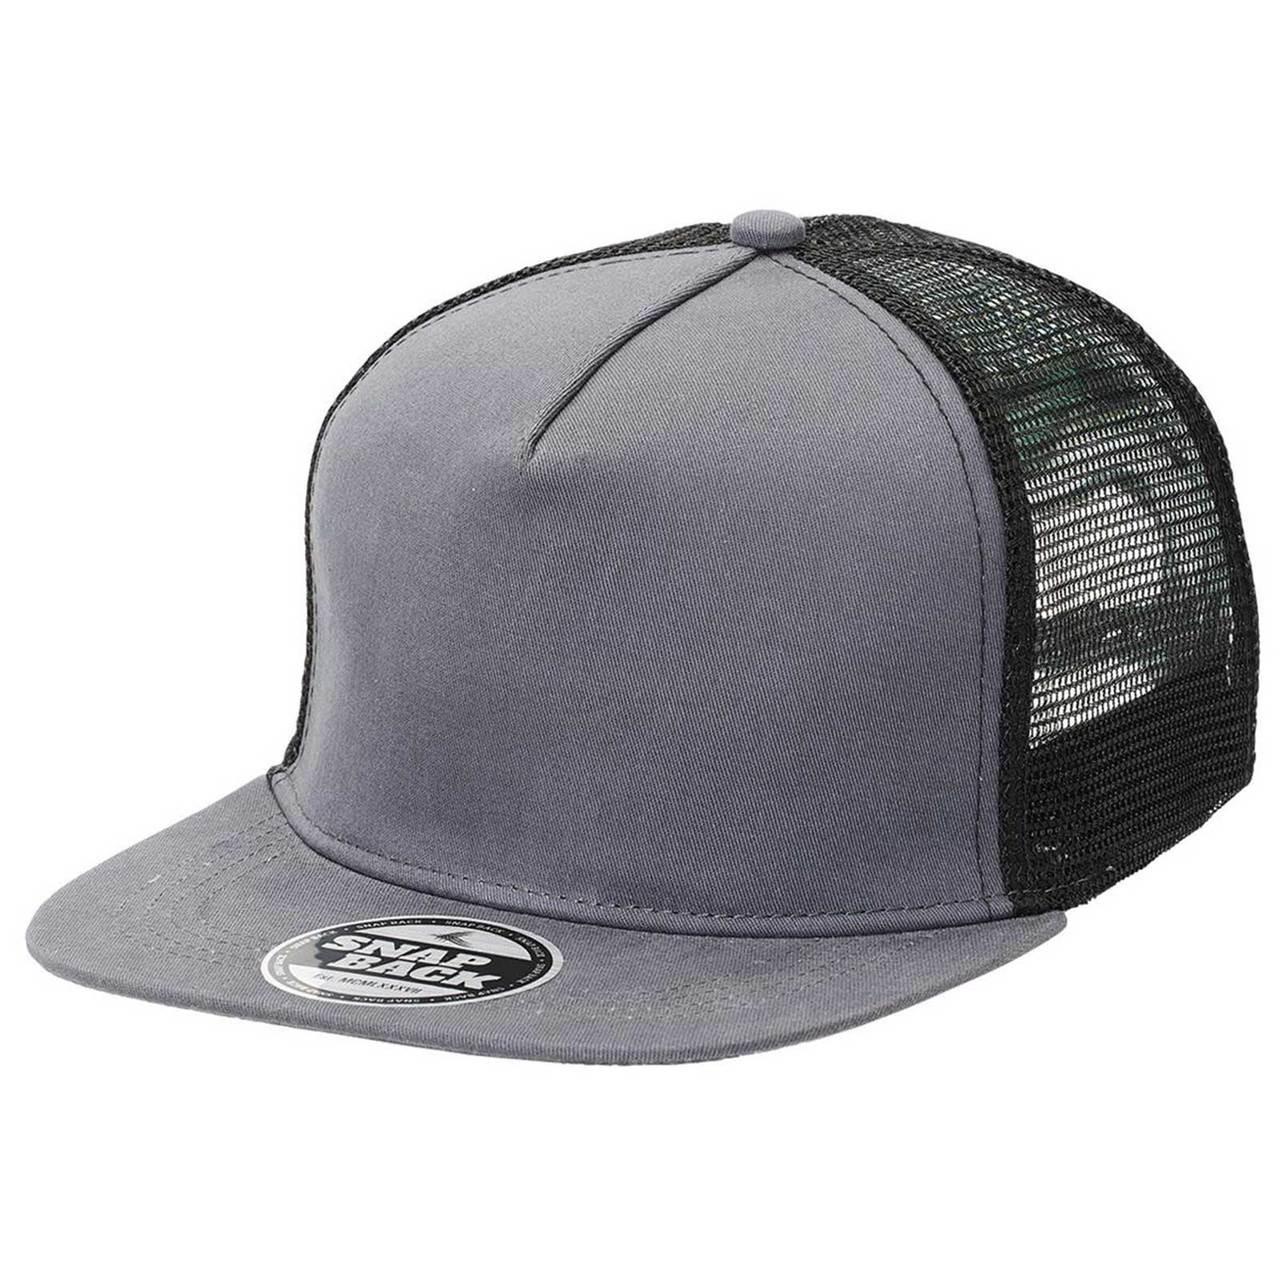 Buy Wholesale Plain Chino Snapback Trucker Caps Online . Bulk Blank Apparel 35a66754e4c